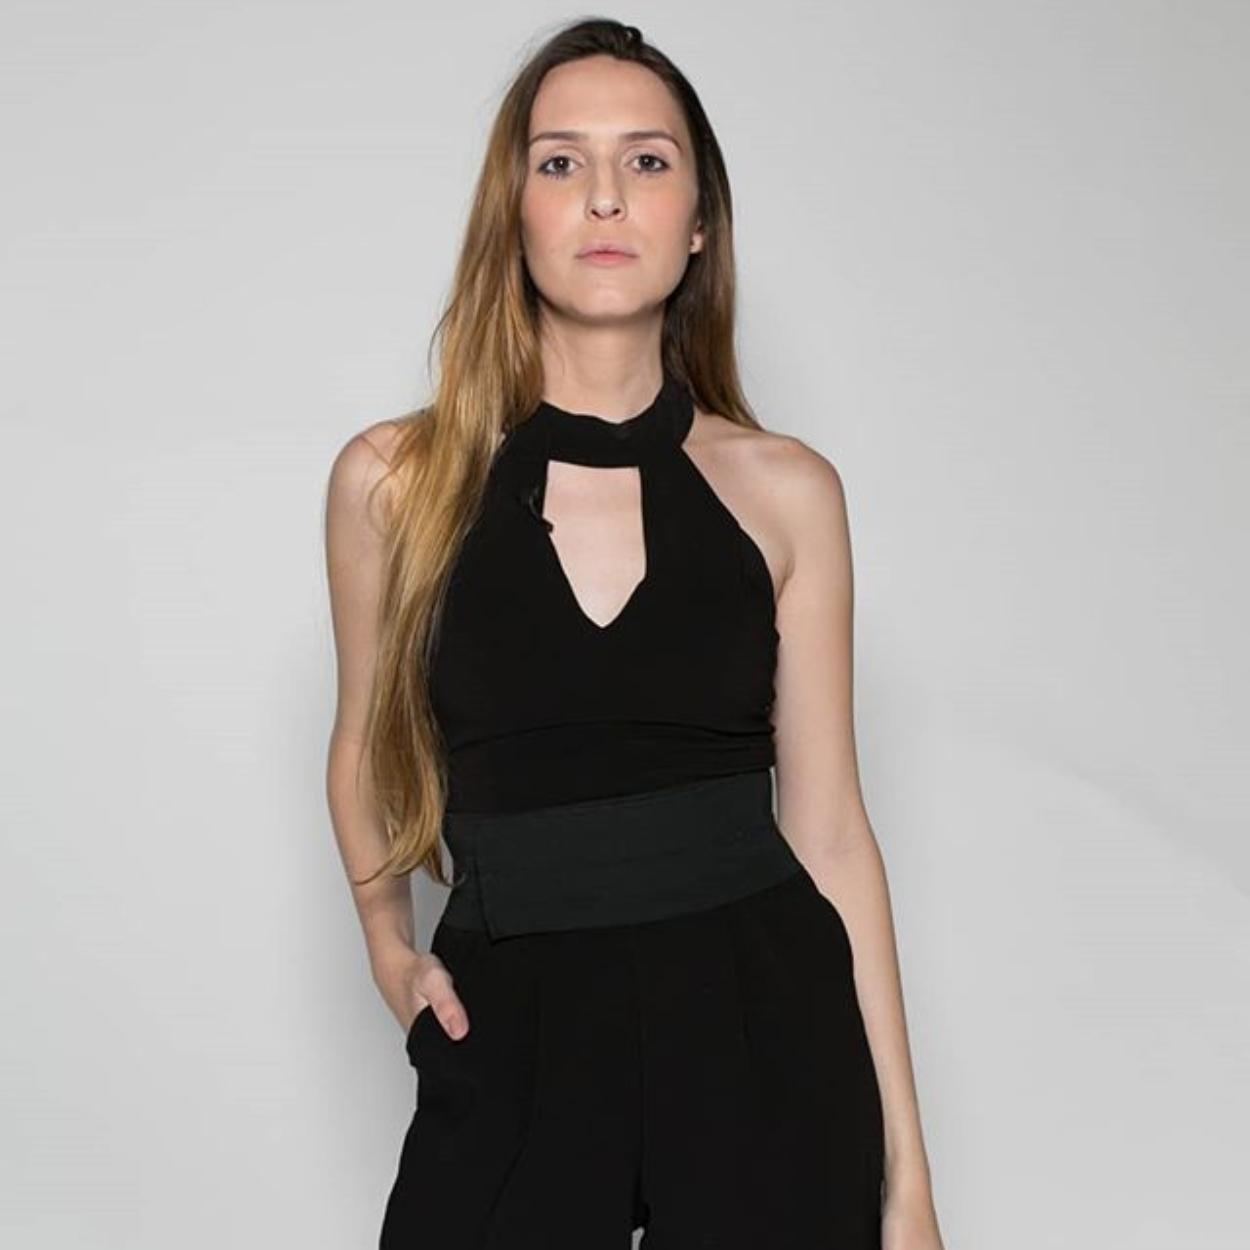 Luna Gruntman born to fashion